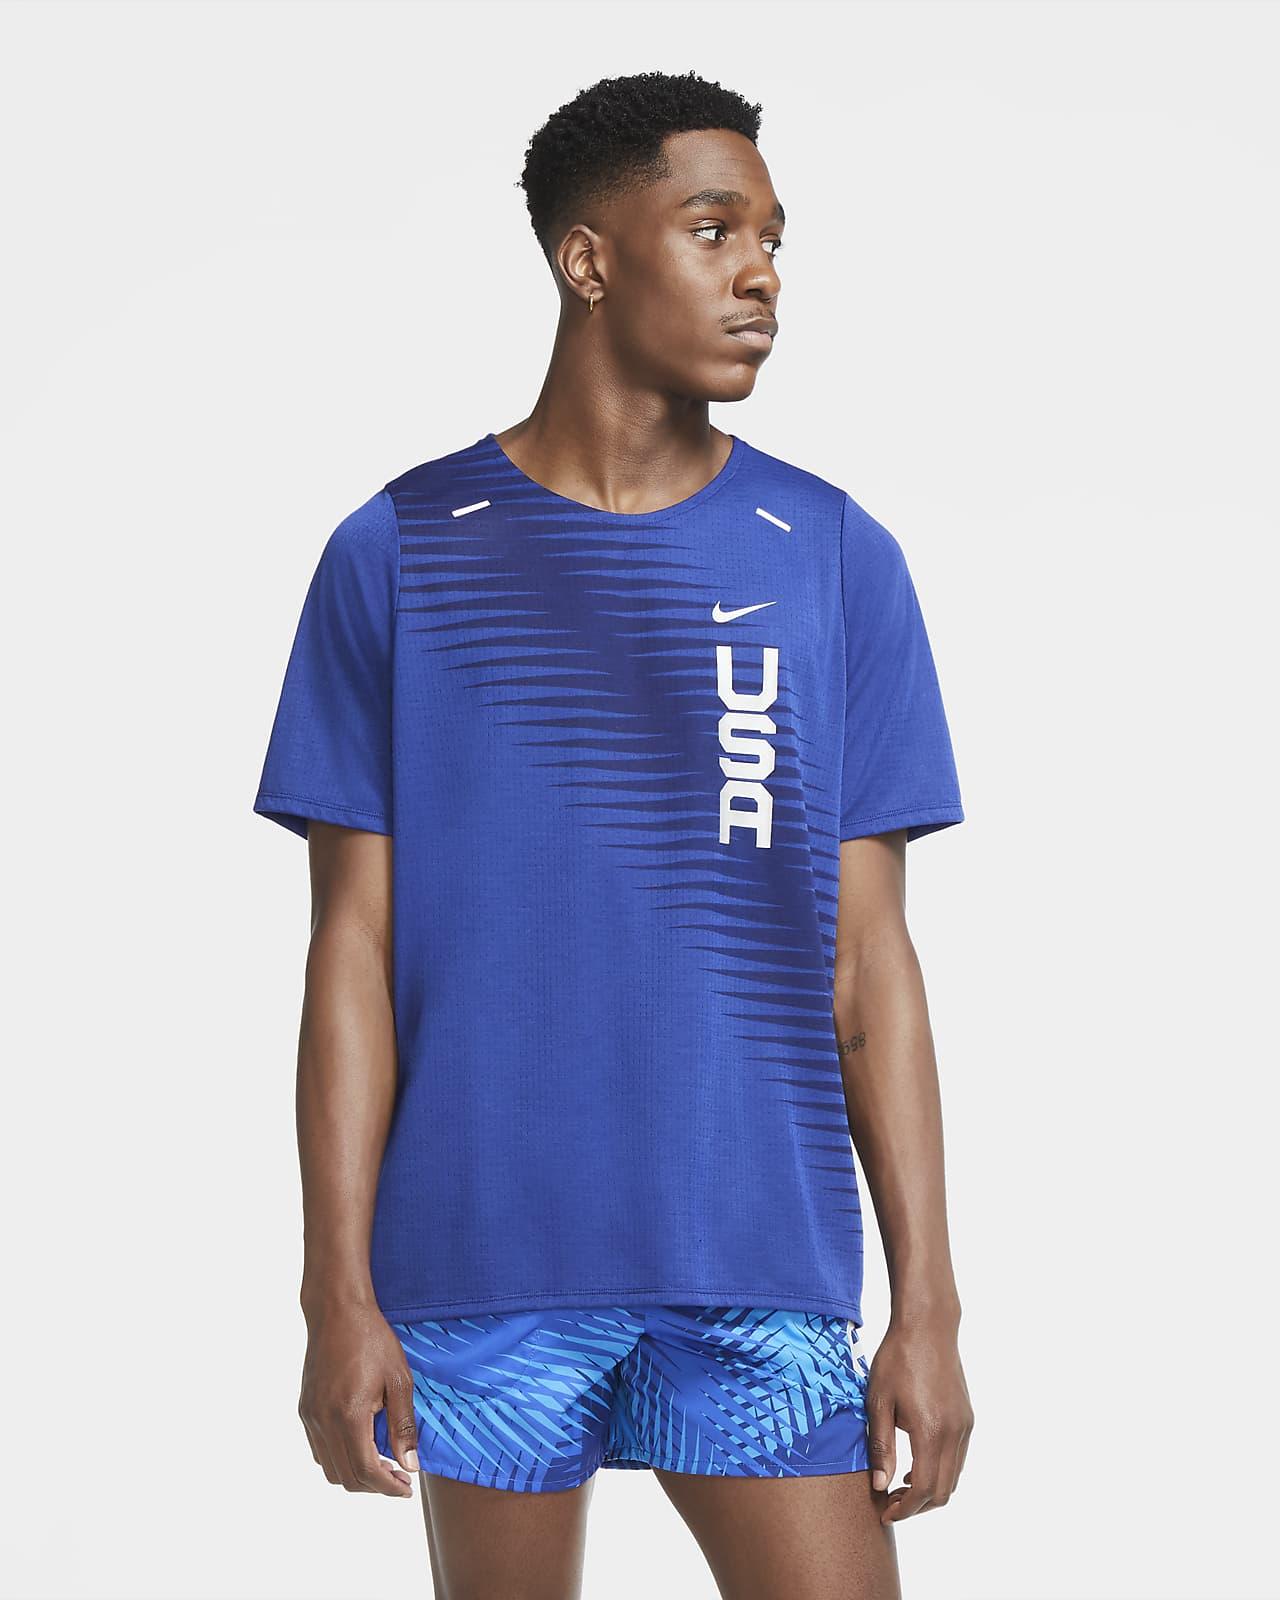 Nike Team USA Rise 365 Men's Short-Sleeve Running Top